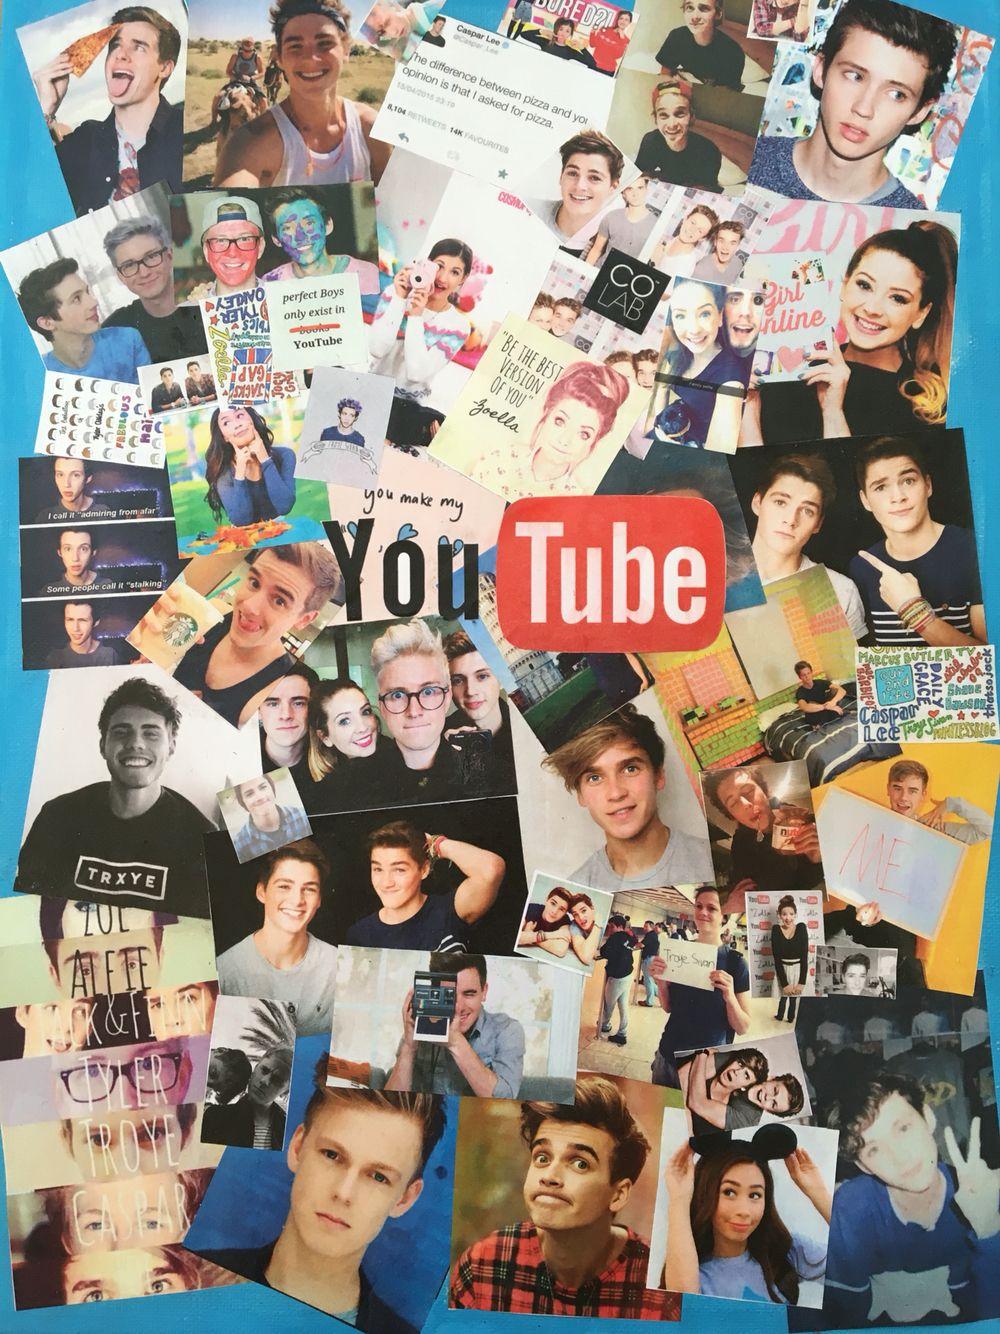 5 Pakistani YouTubers Creating Impressive Content